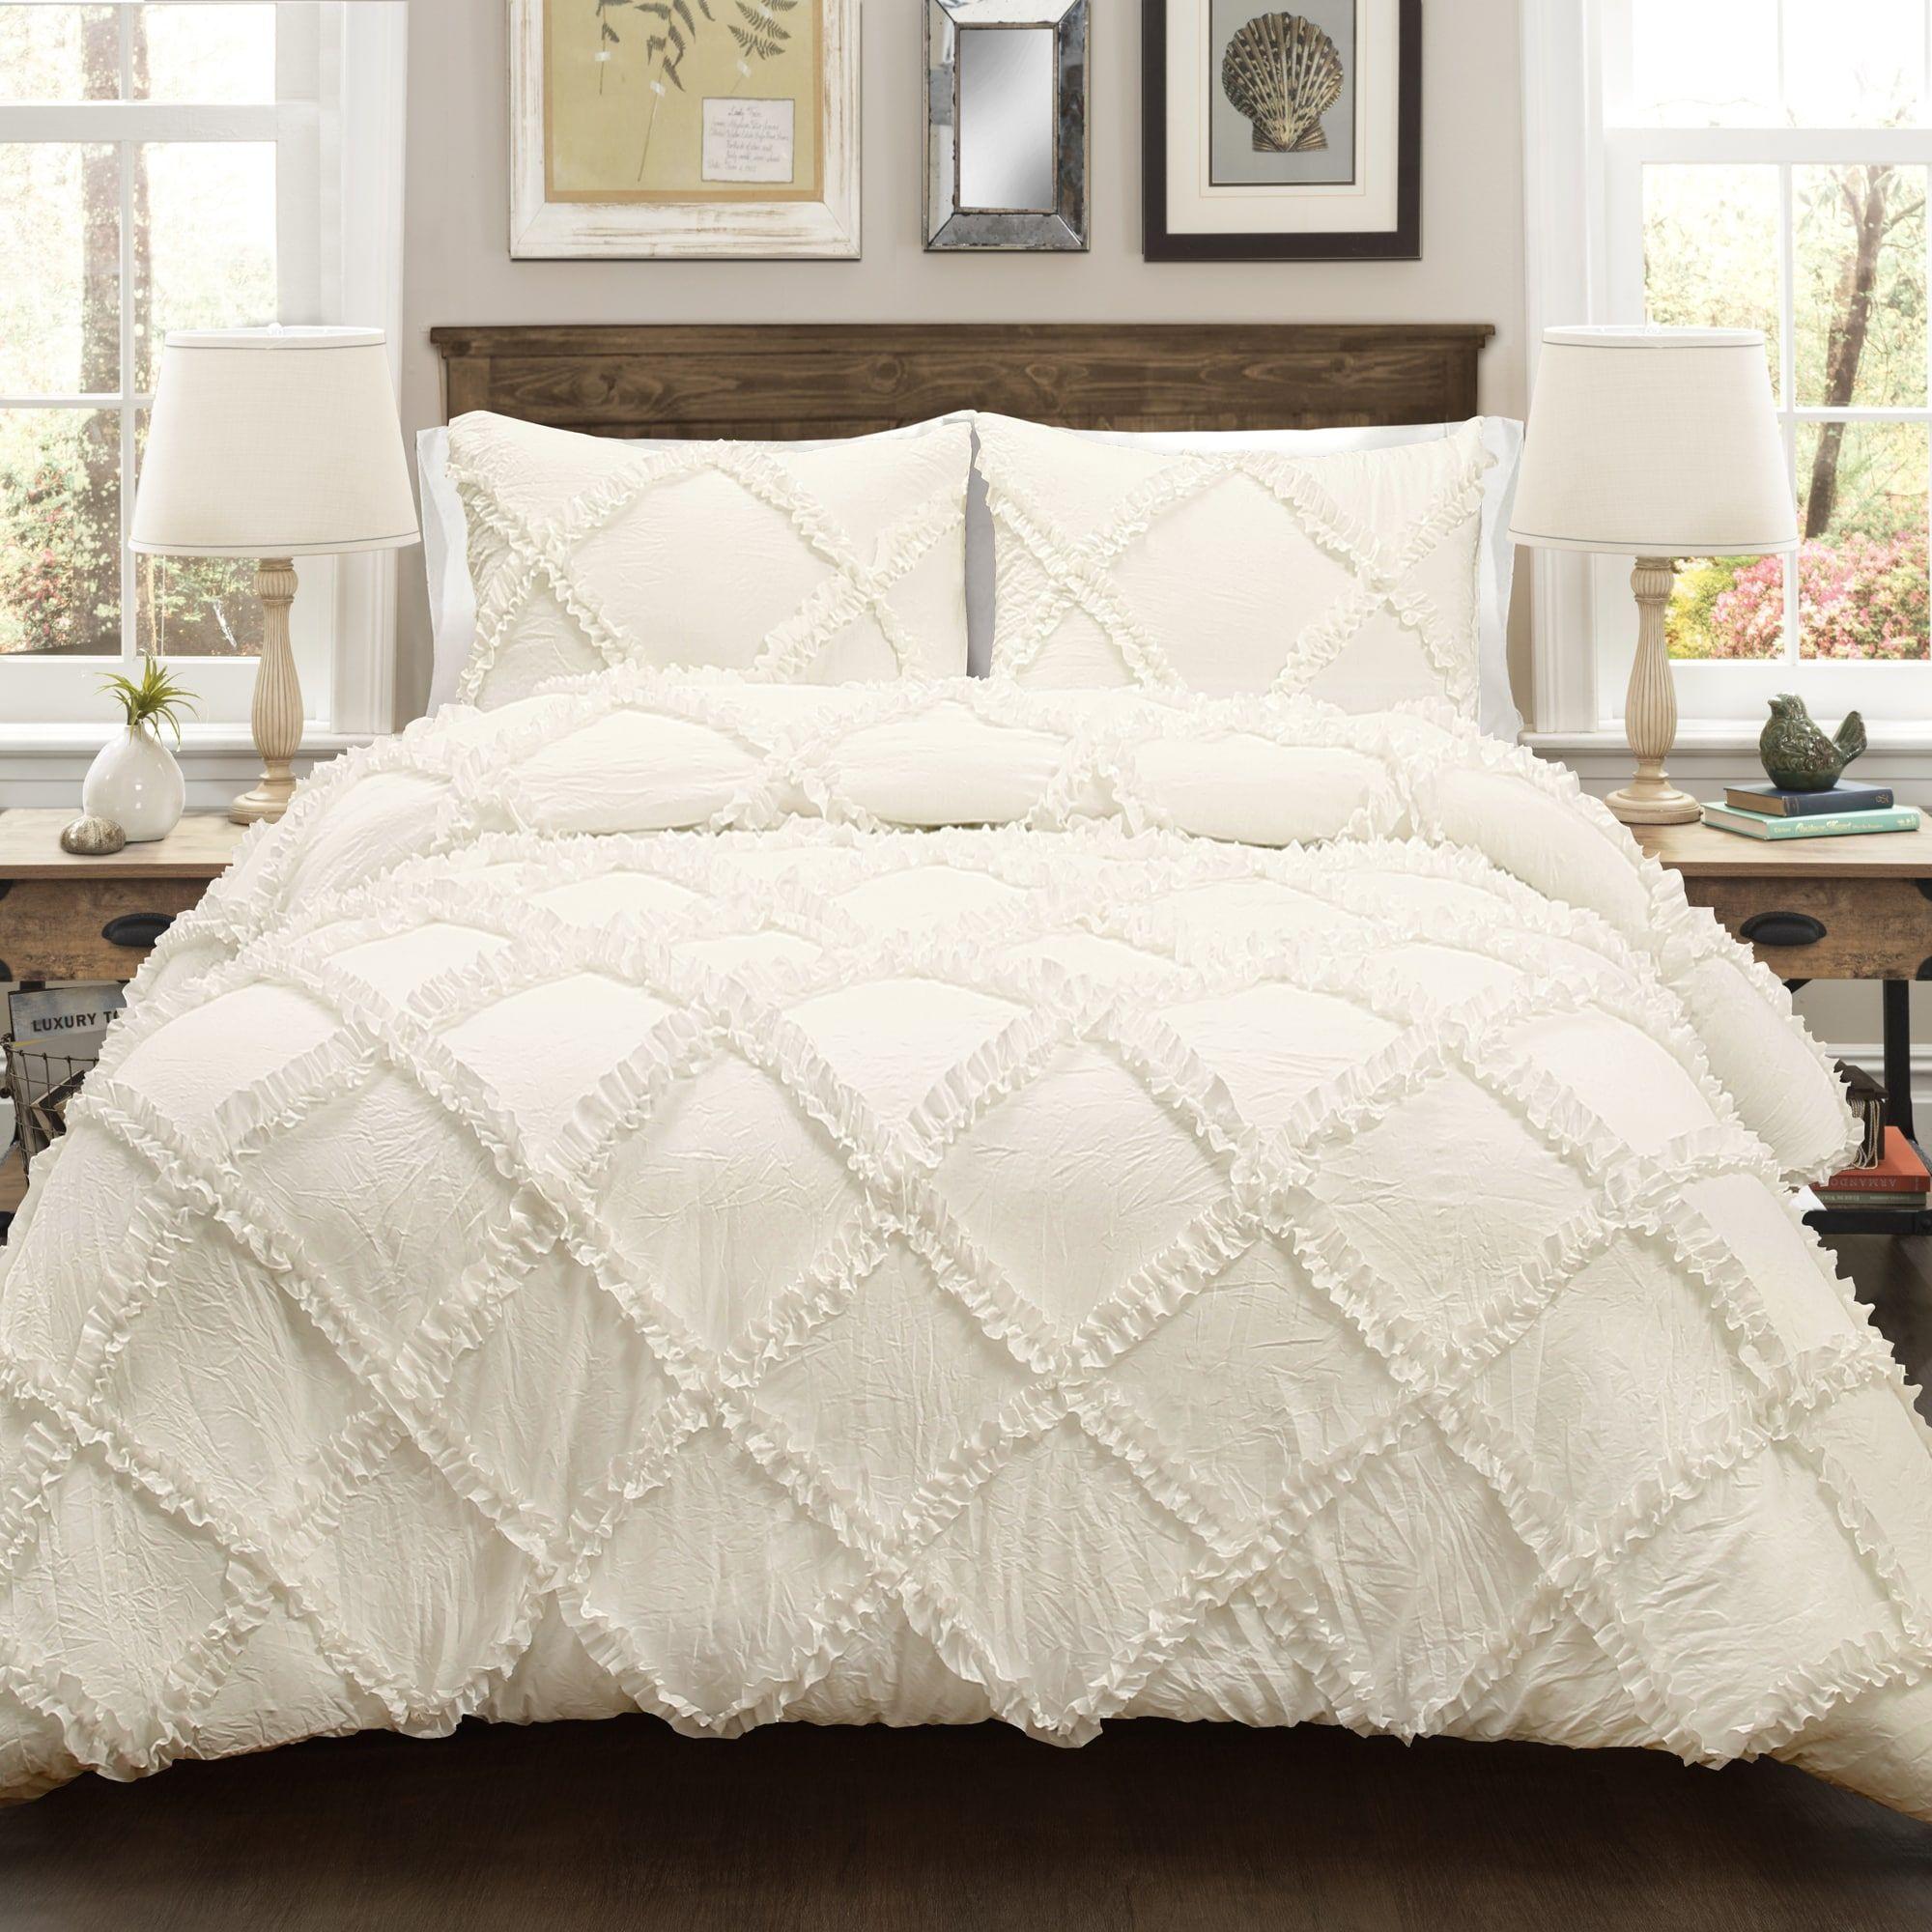 Lush Decor Ruffle Diamond 3 Piece Comforter Set Off White Beige King Comforter Sets Lush Decor Shabby Chic Room